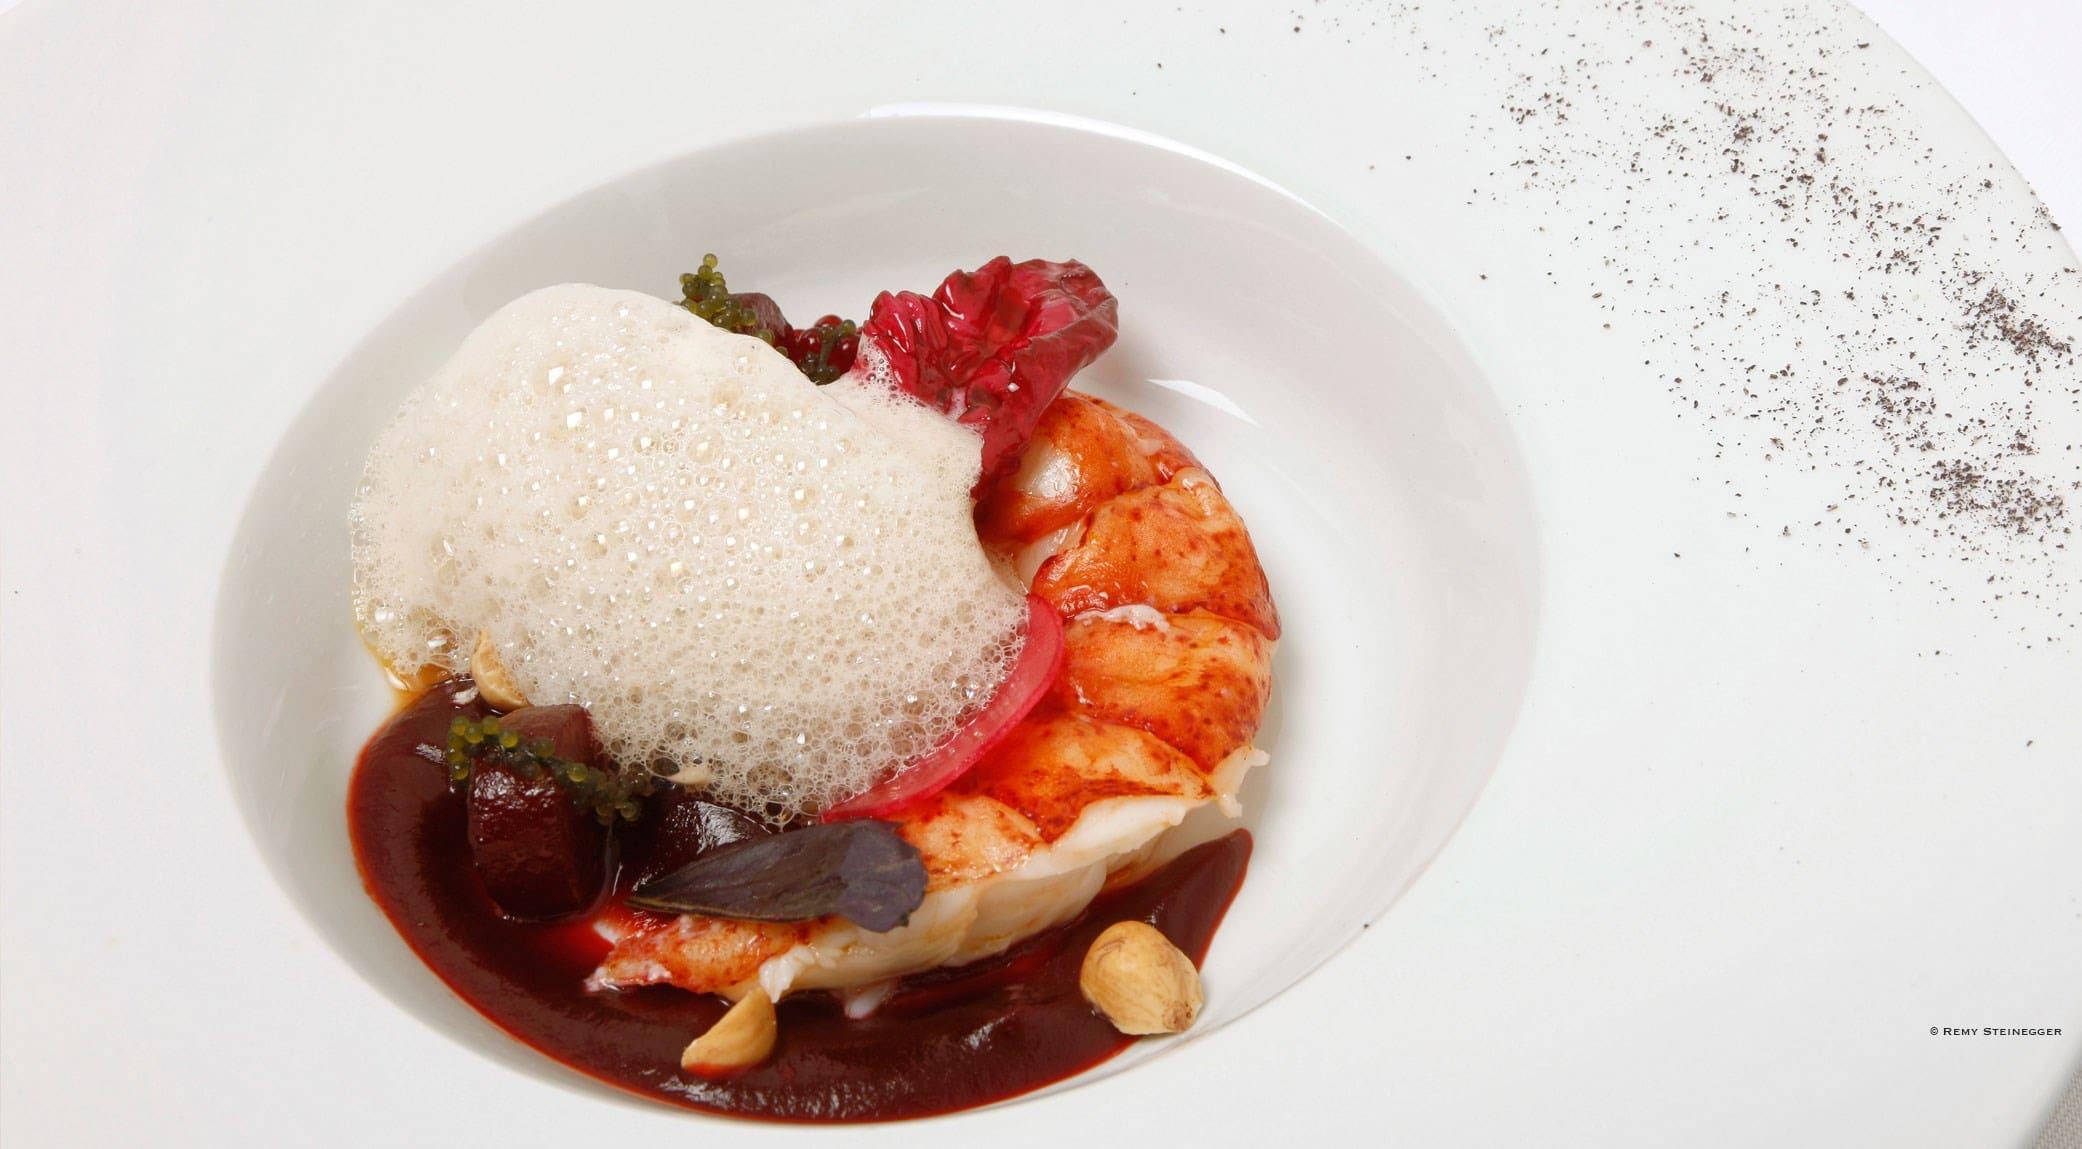 original_10-SPellegrino-Sapori-Ticino-Dish-Thomas-B-hner.jpg